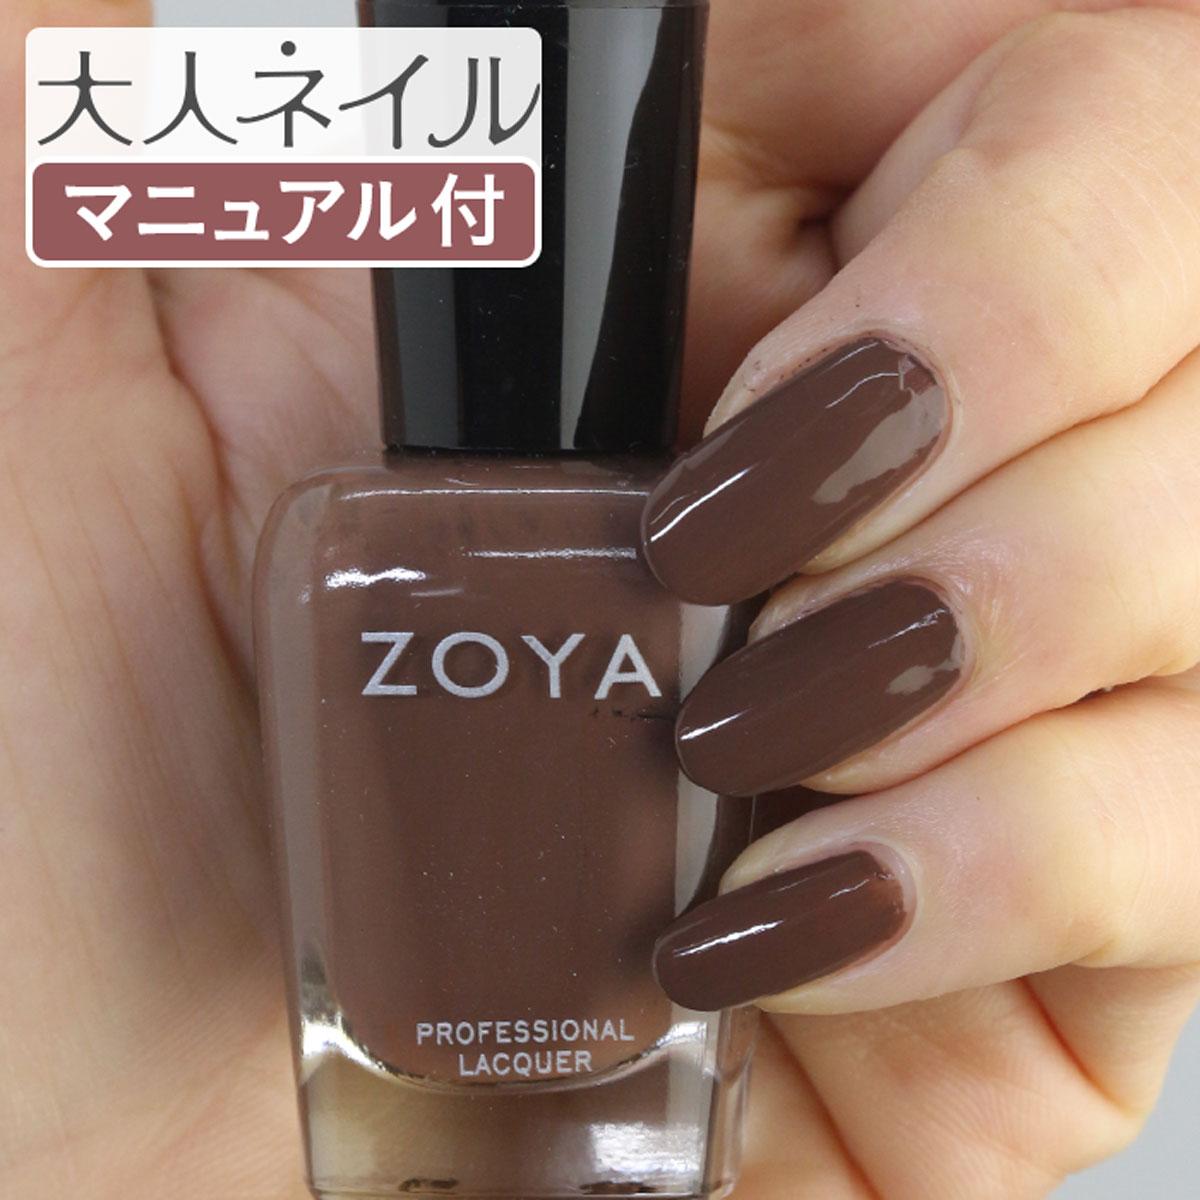 ZOYA ゾーヤ ゾヤ ネイルカラー ZP881 15mL Gina naturel3 自爪 の為に作られた ネイル にやさしい 自然派 マニキュア zoya セルフネイル にもおすすめ ブラウン チョコレート 秋ネイル 秋カラー